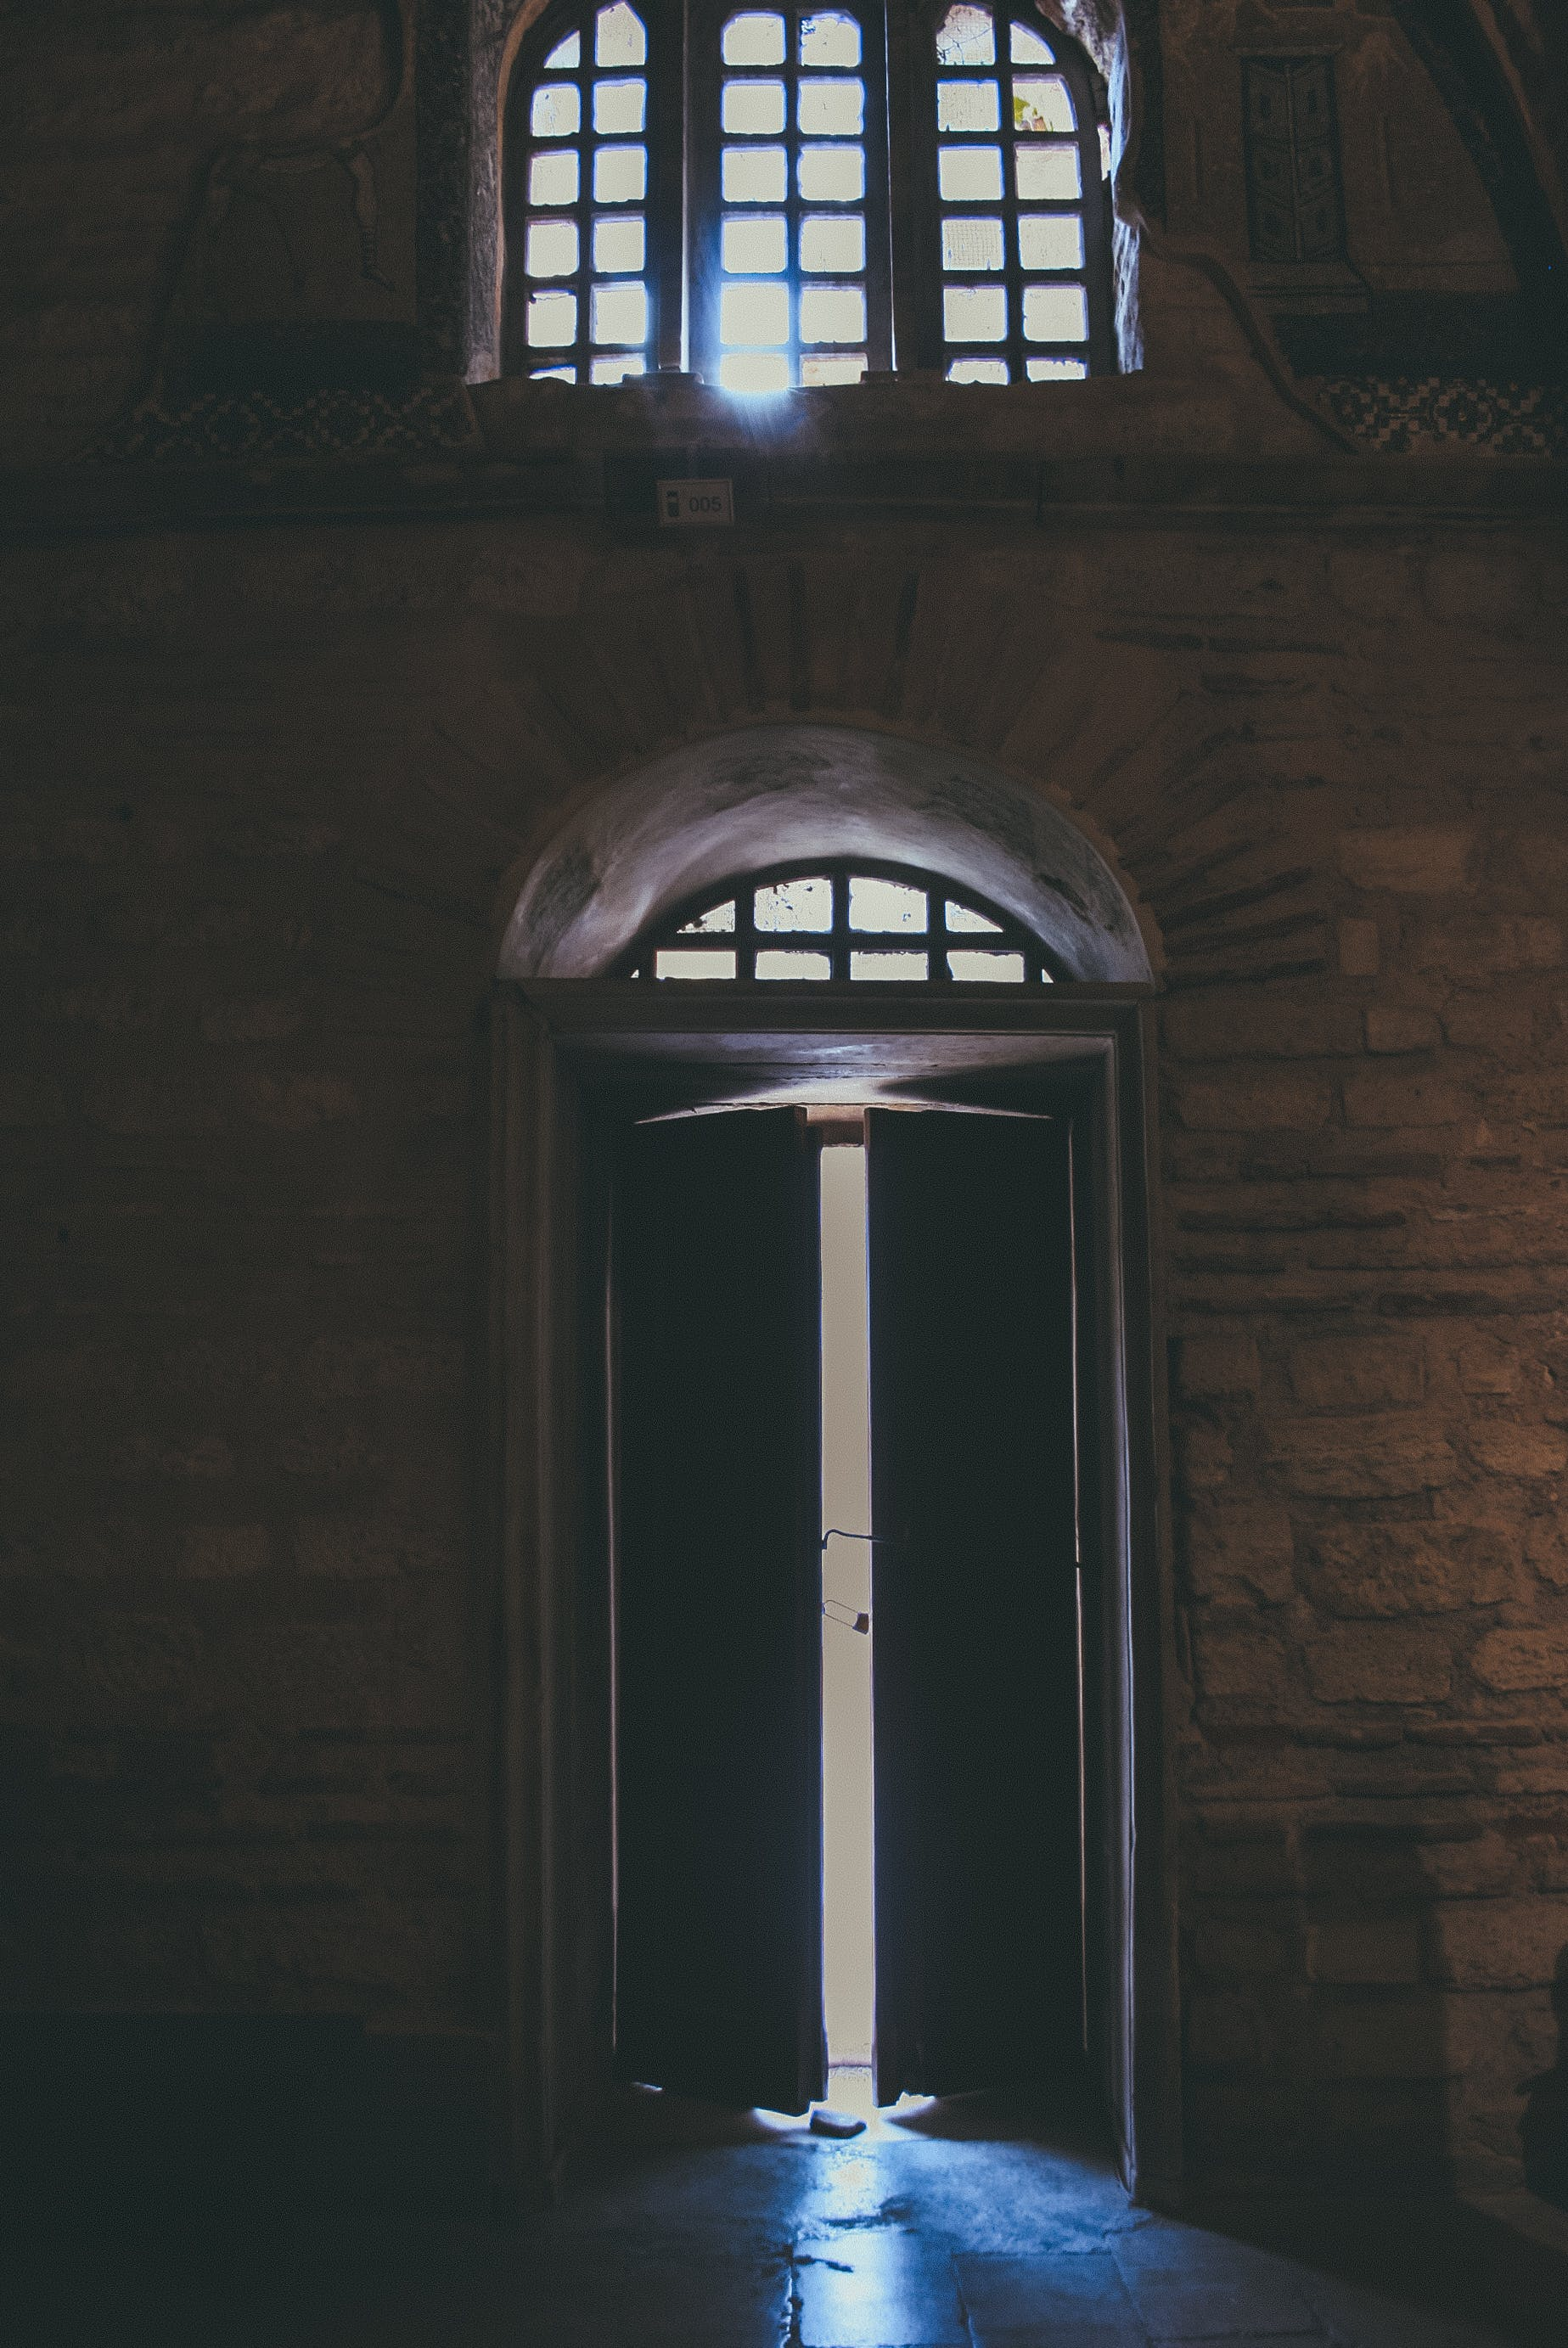 French Doors Slightly Opened